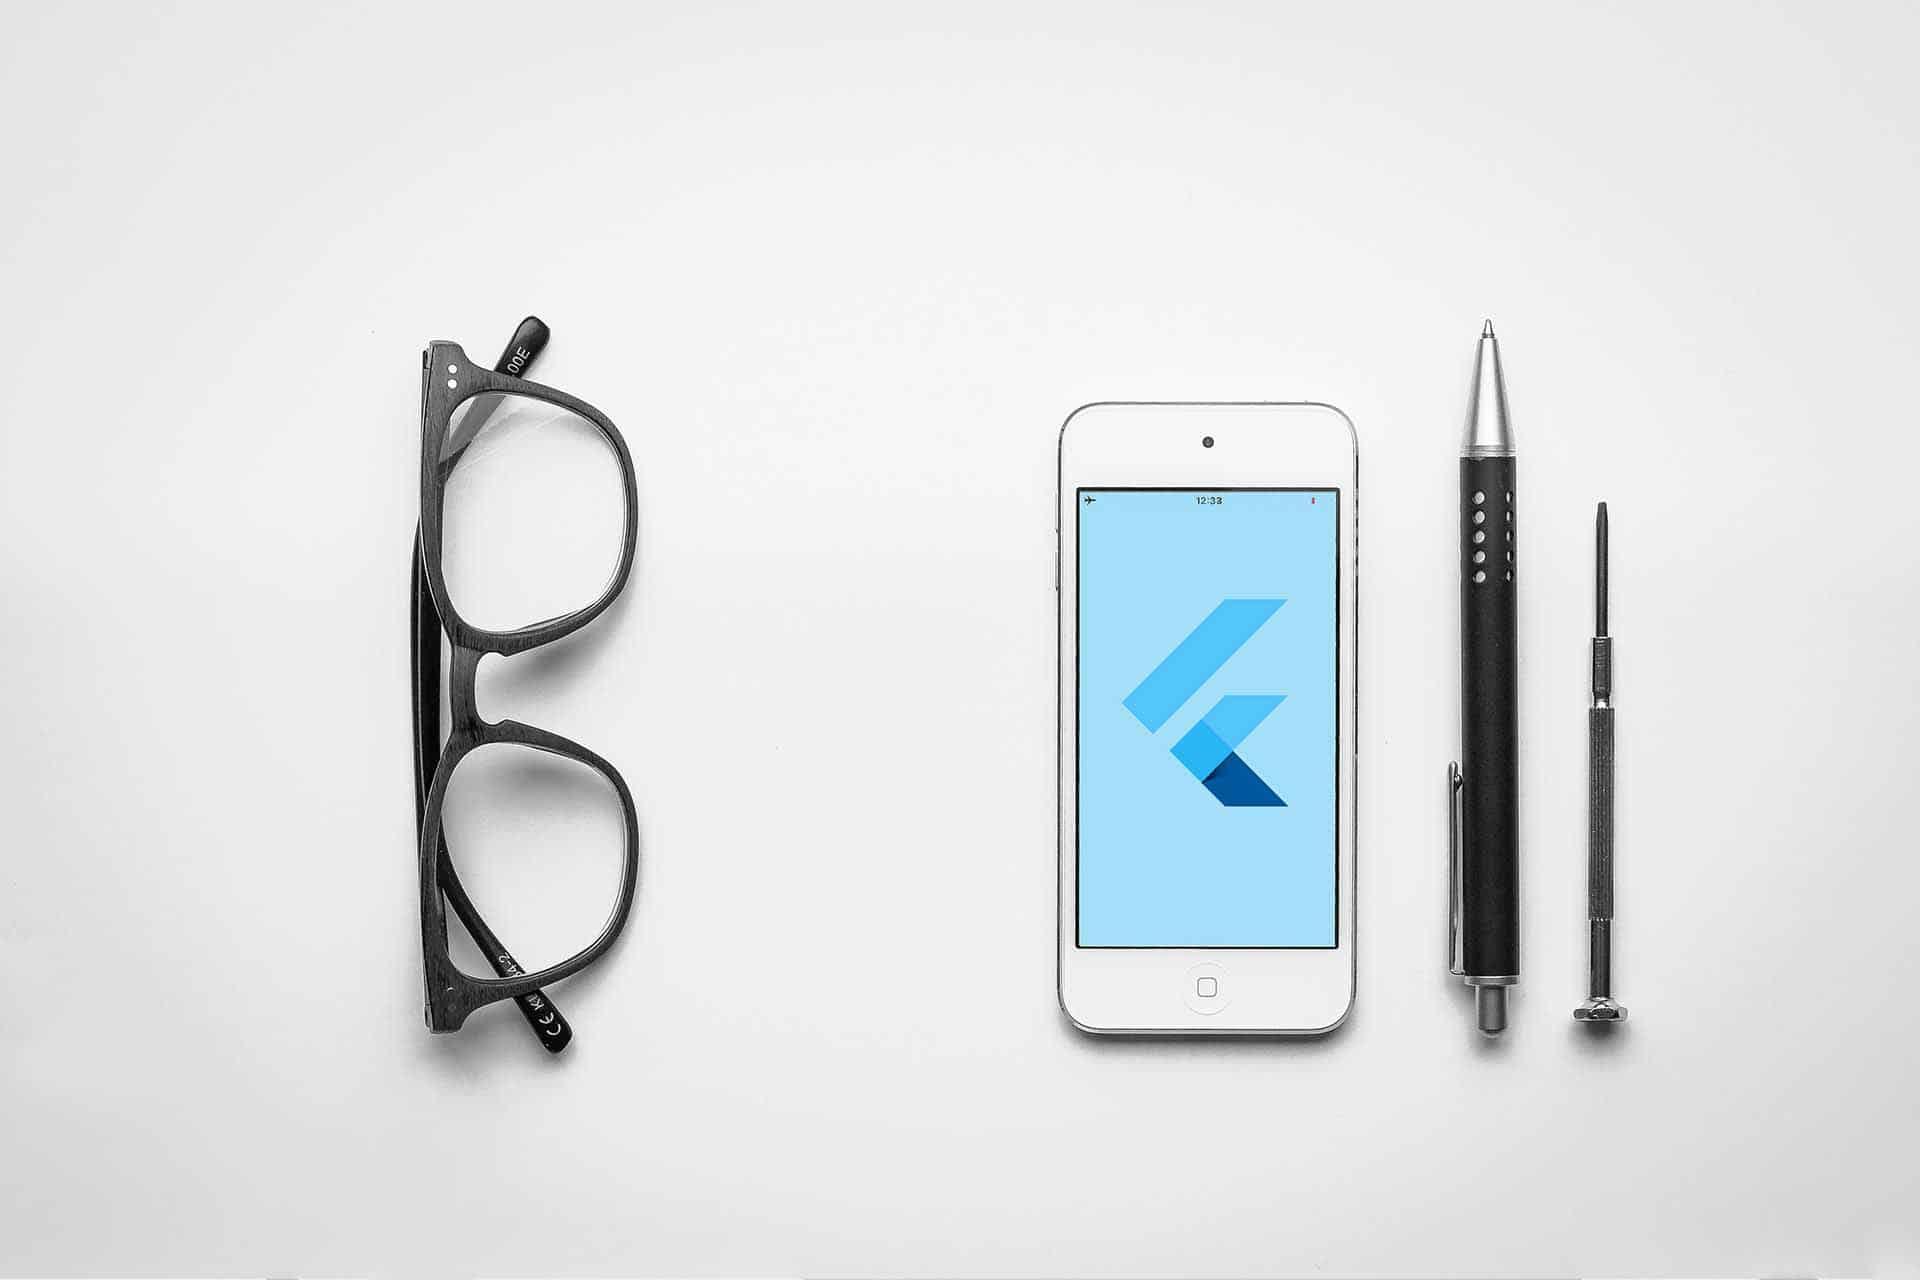 t2informatik Blog: Create smartphone applications with Flutter